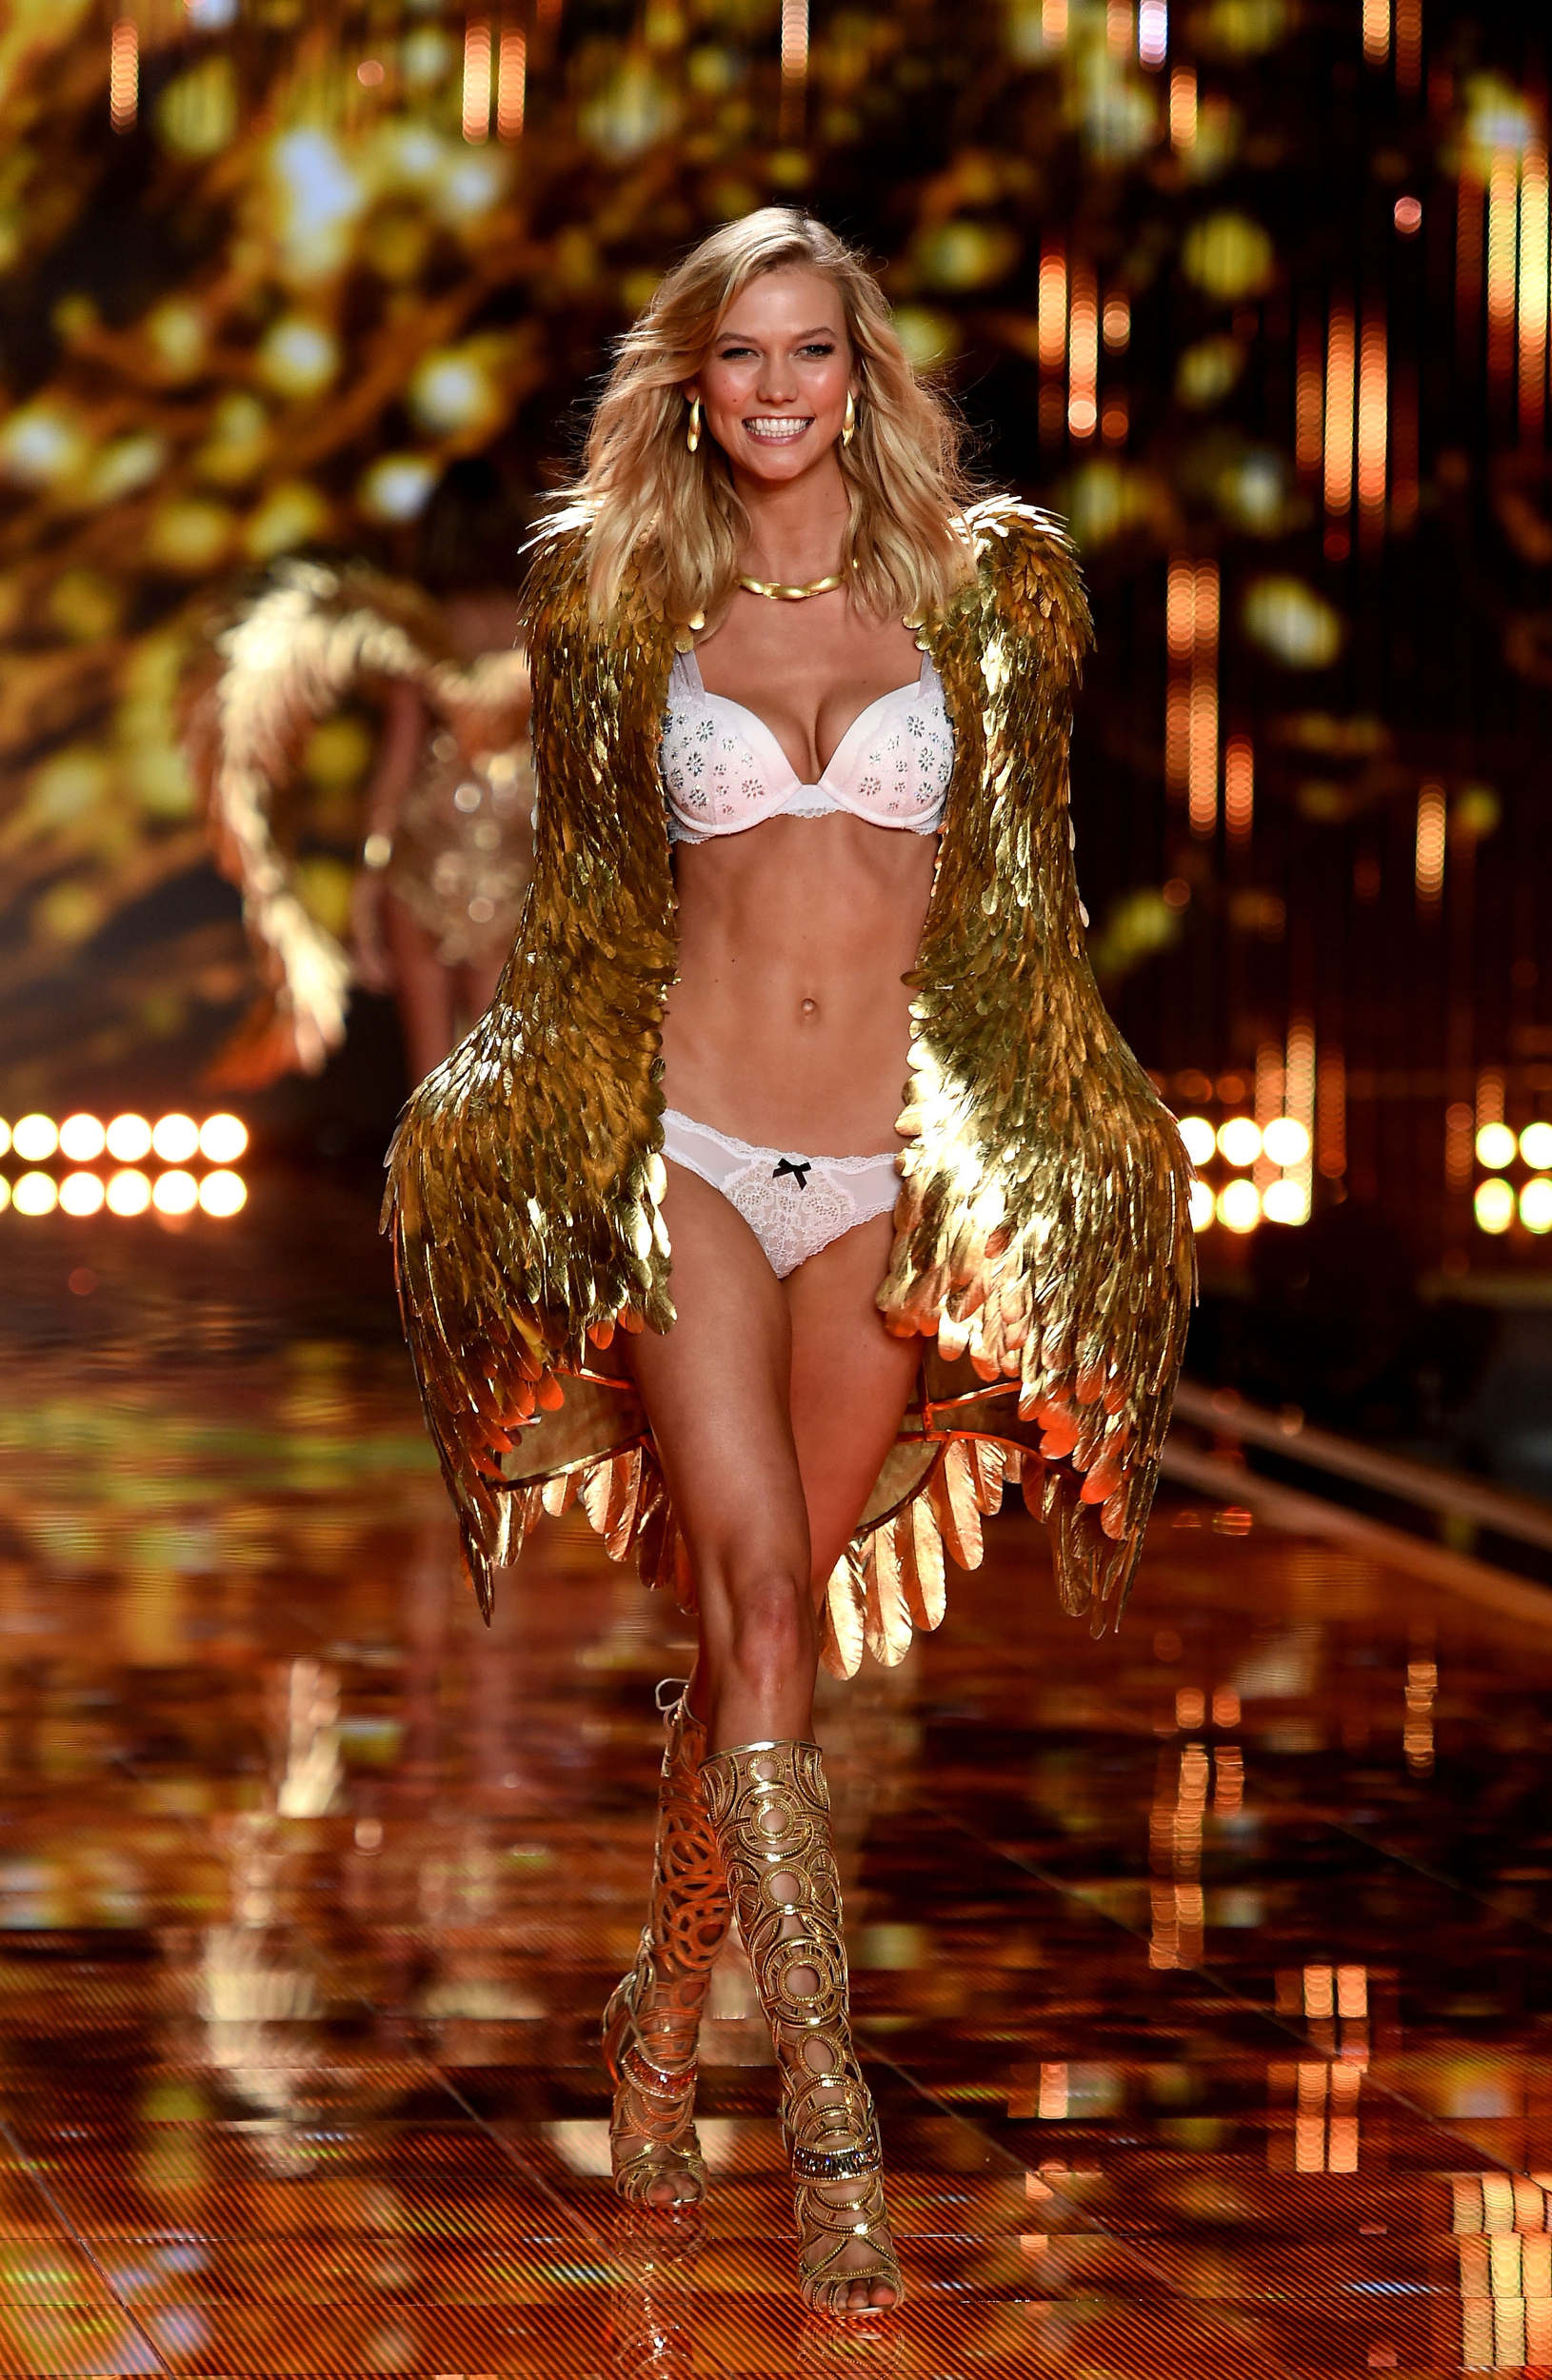 Модель Карли Клосс ушла из Victoria's Secret